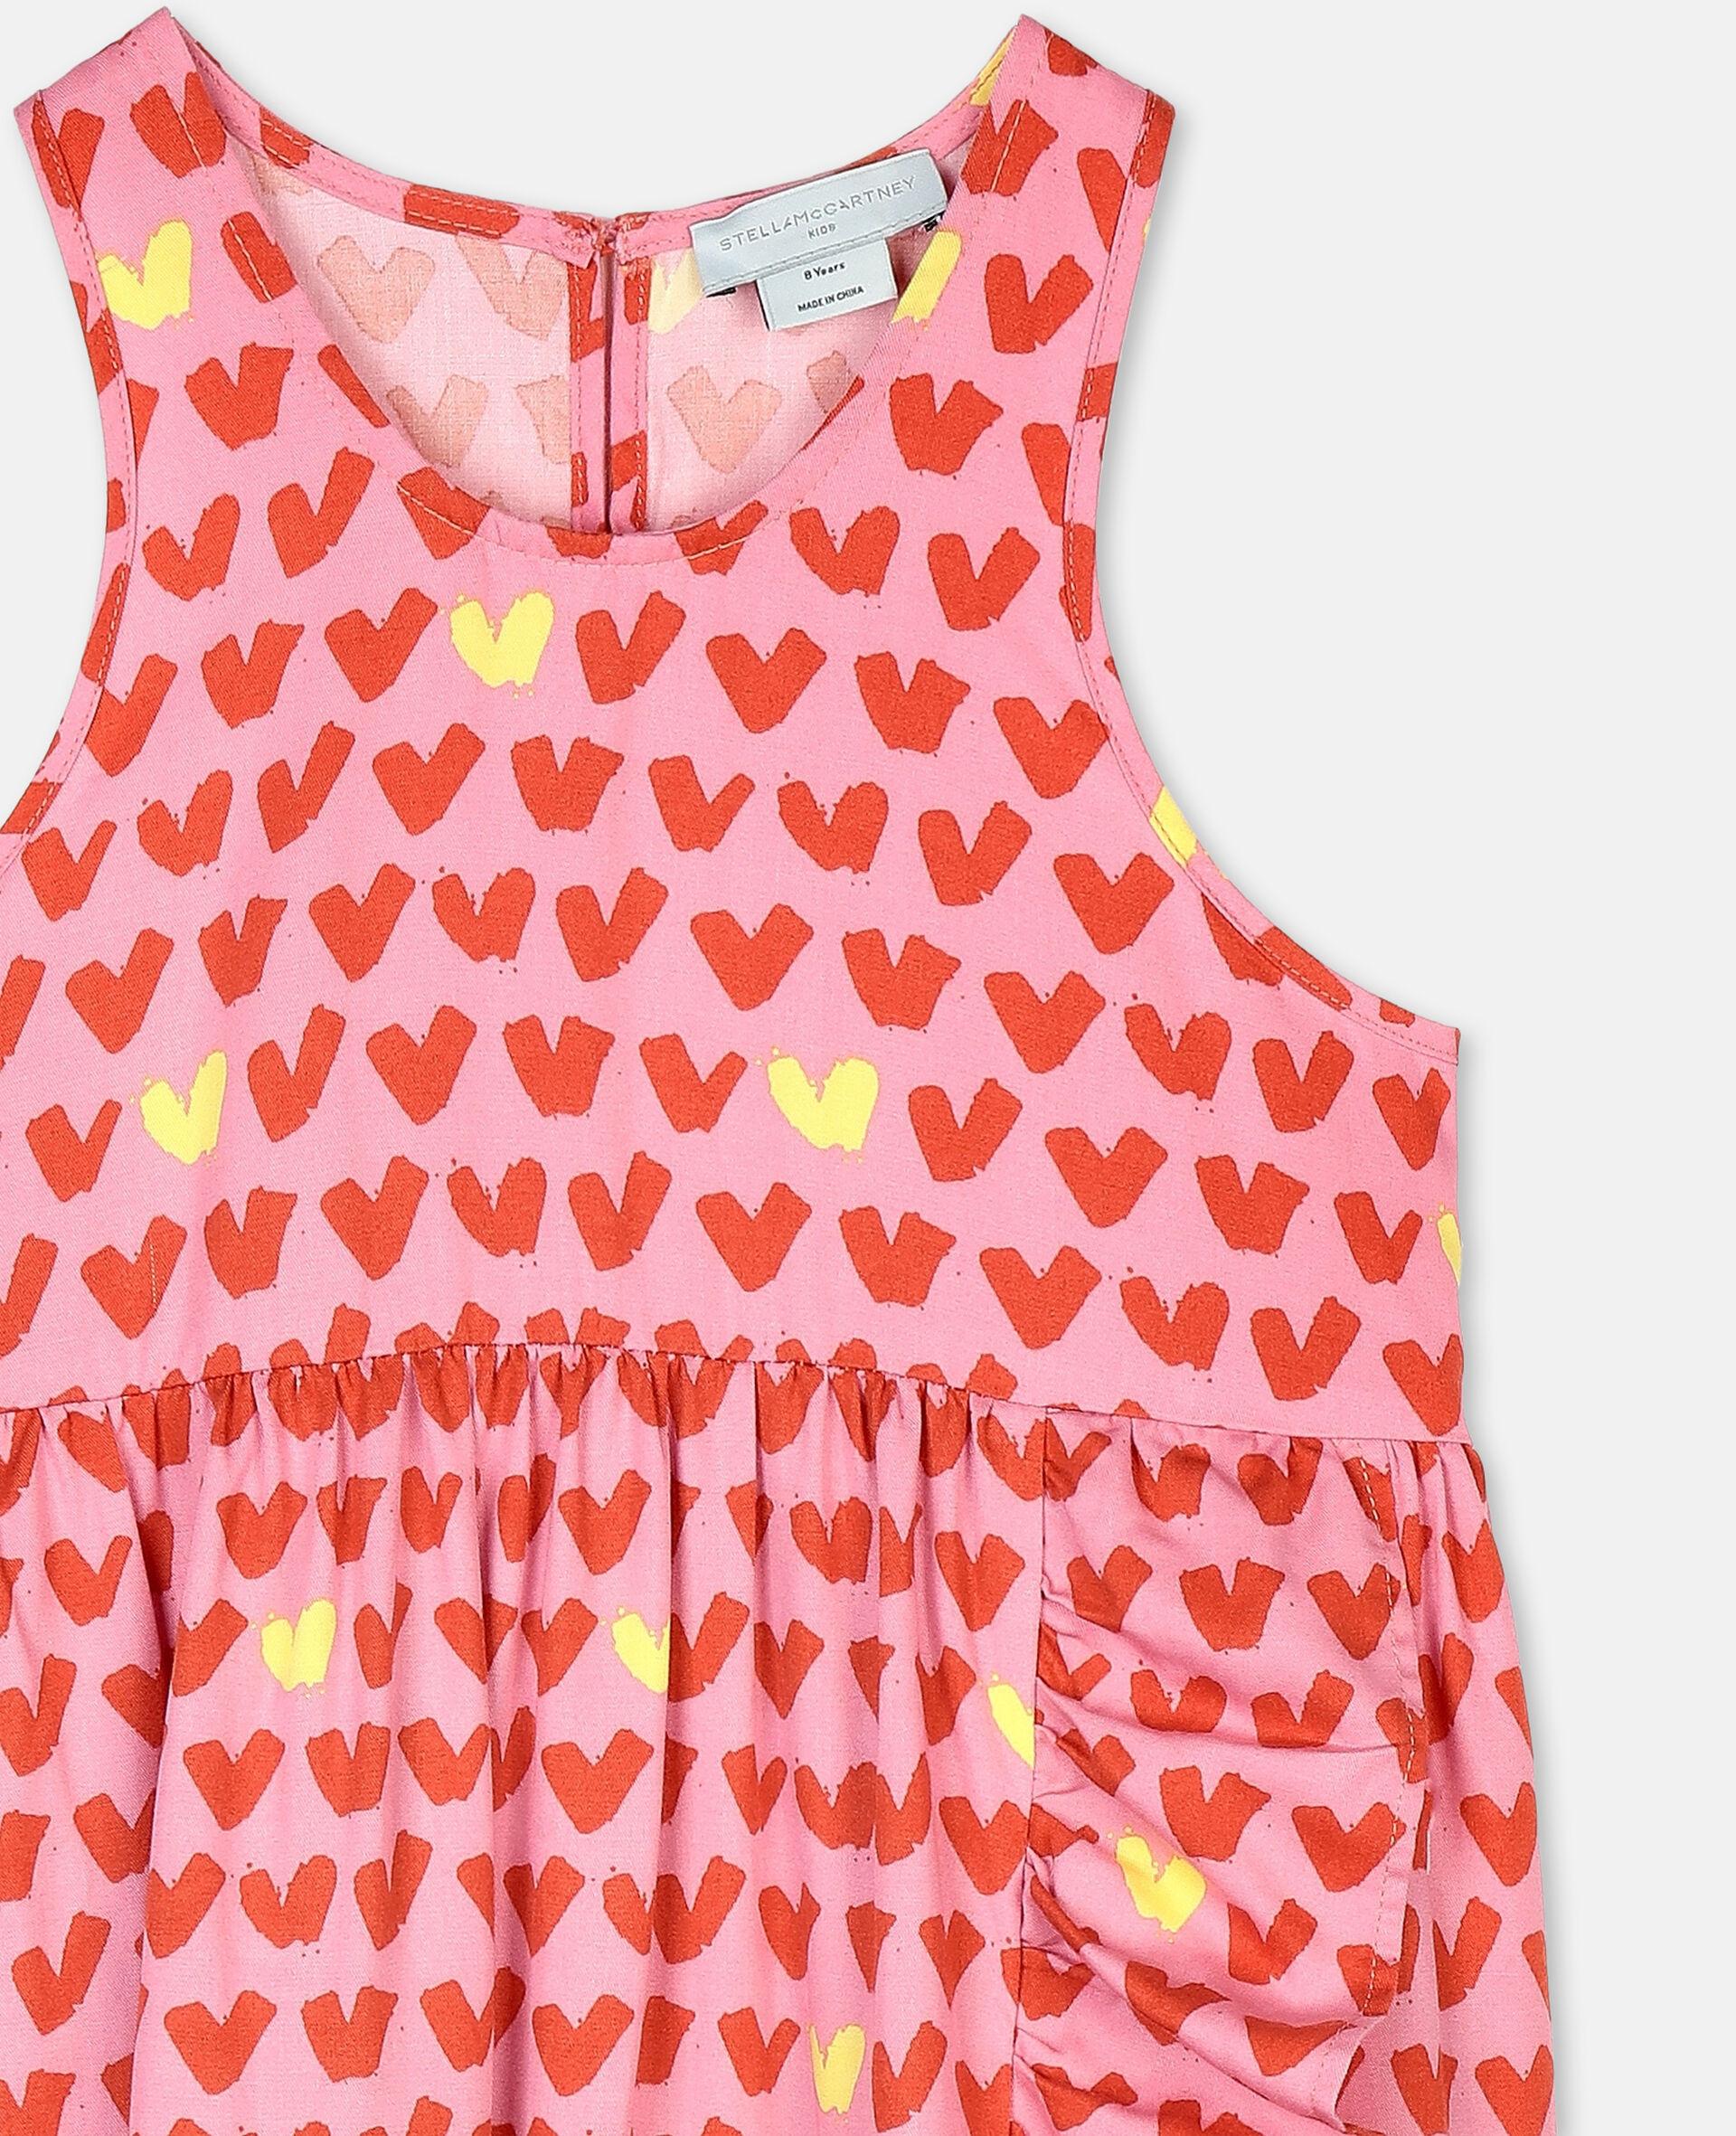 Hearts 粘胶纤维斜纹布连衣裙-粉色-large image number 1